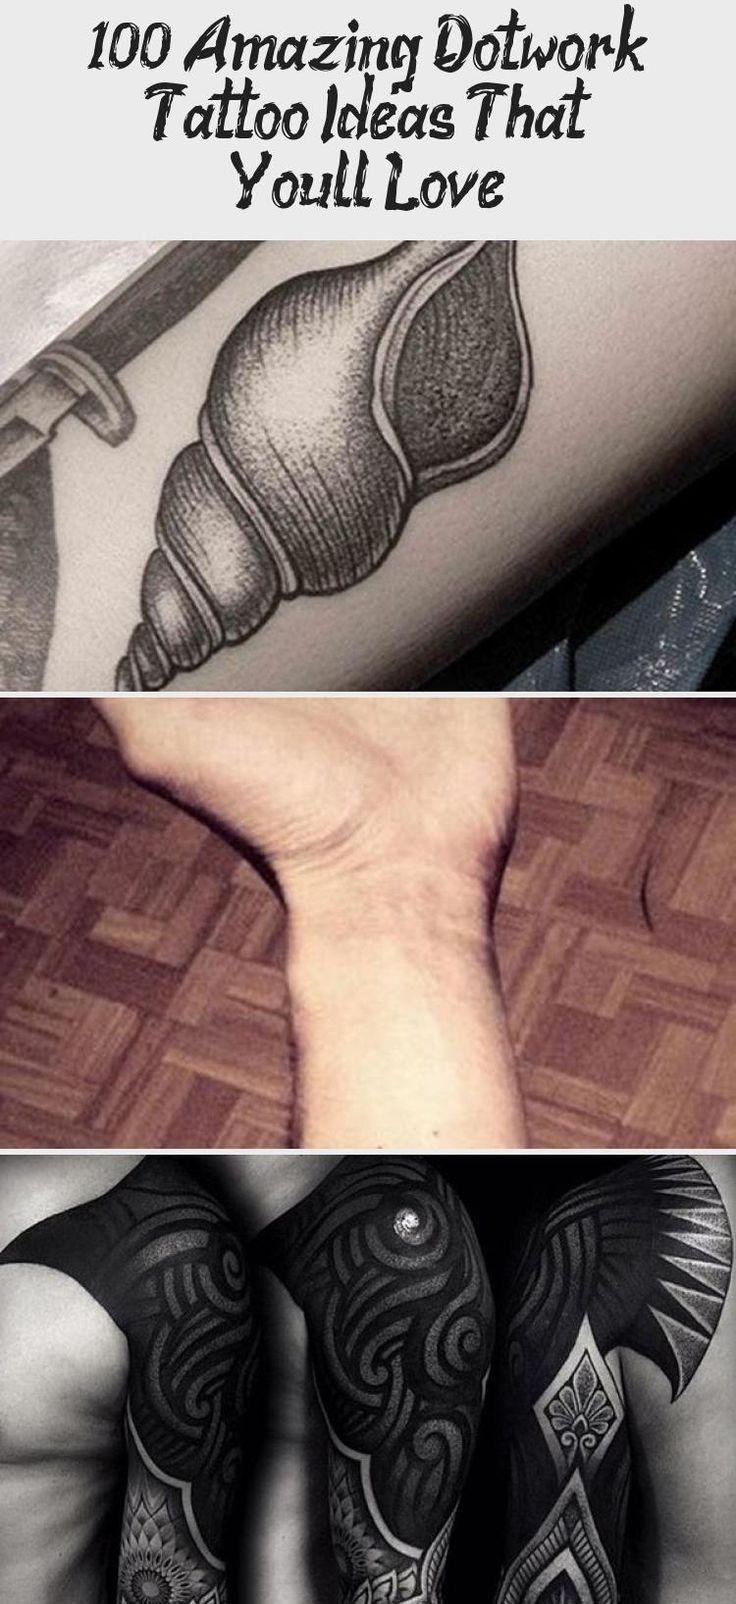 Nose piercings polynesian tattoos women foot, polynesian tattoos women sleeve, polynesian tattoo designs sleeve